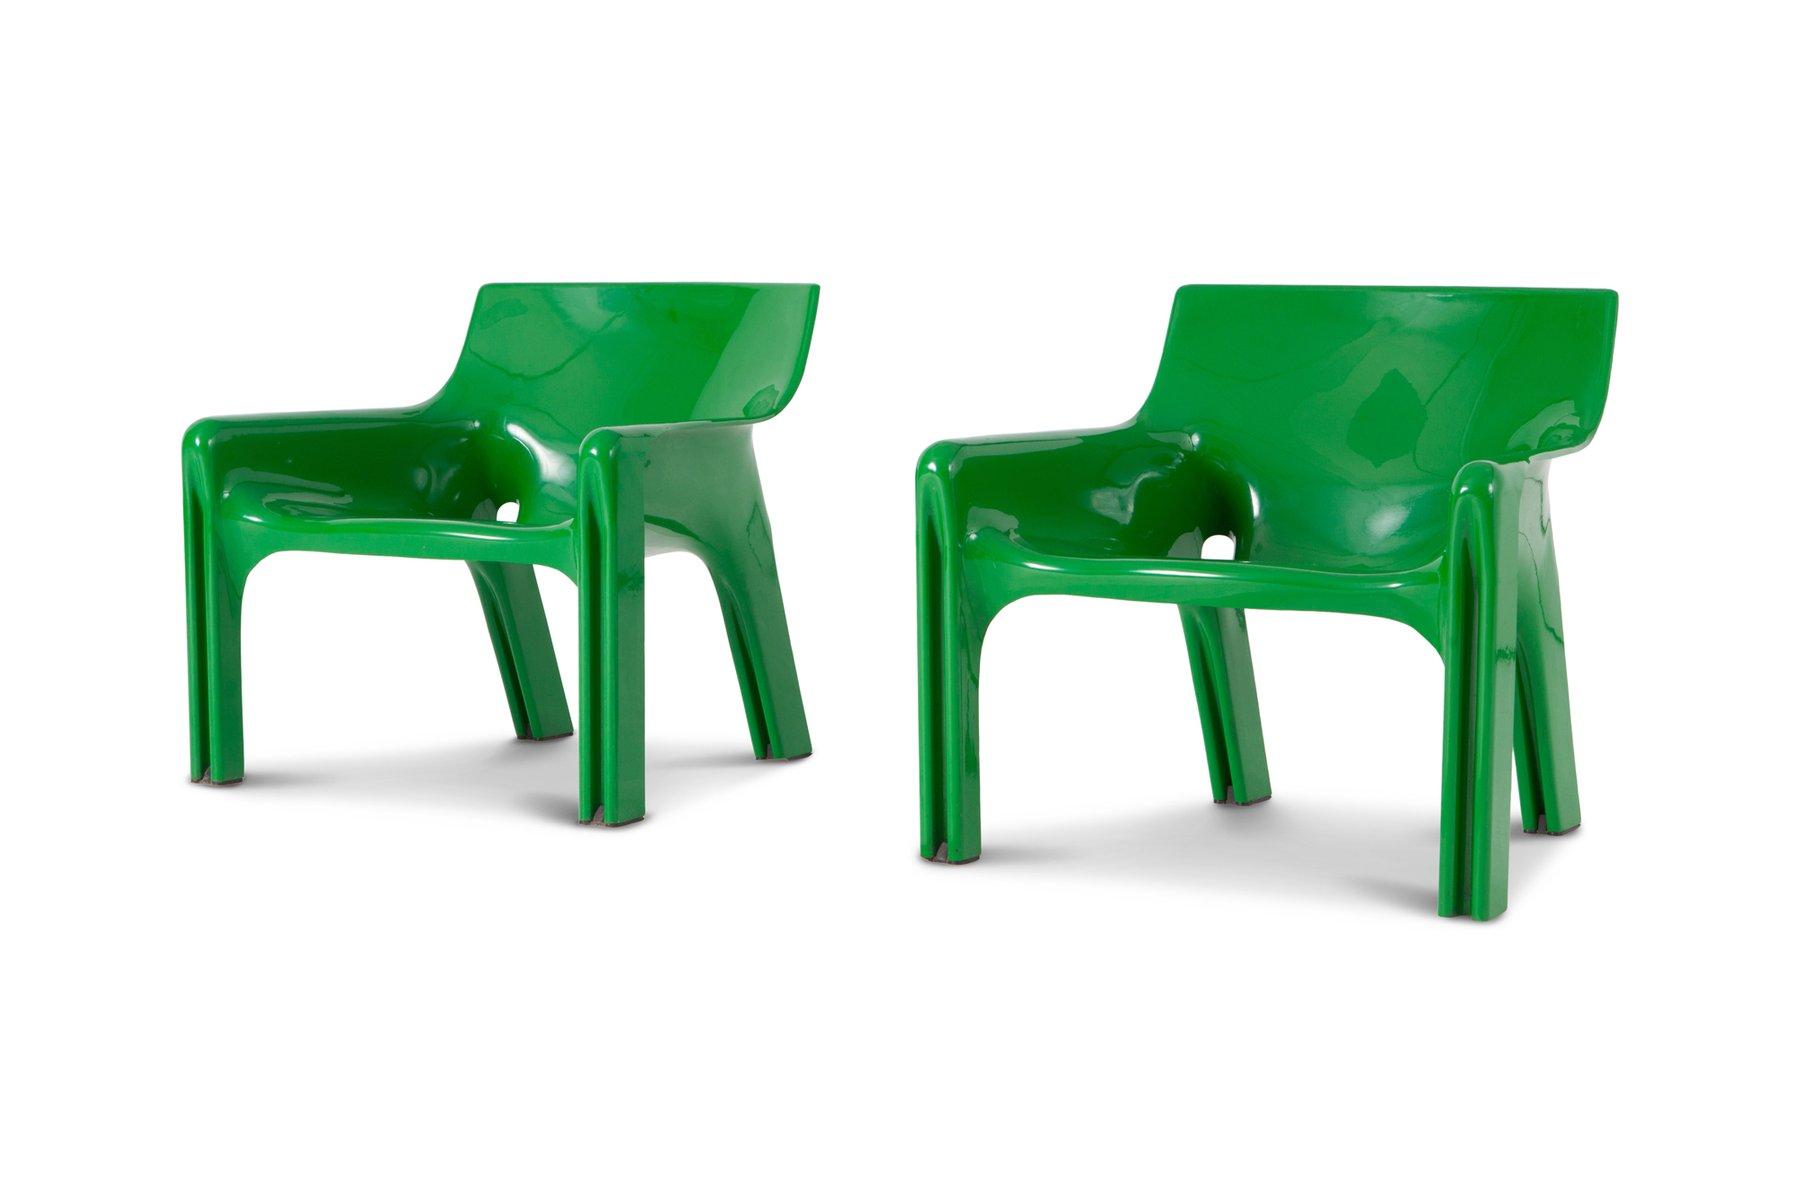 Grüne Vicario Sessel von Vico Magistretti für Artemide, 1970er, 2er Se...